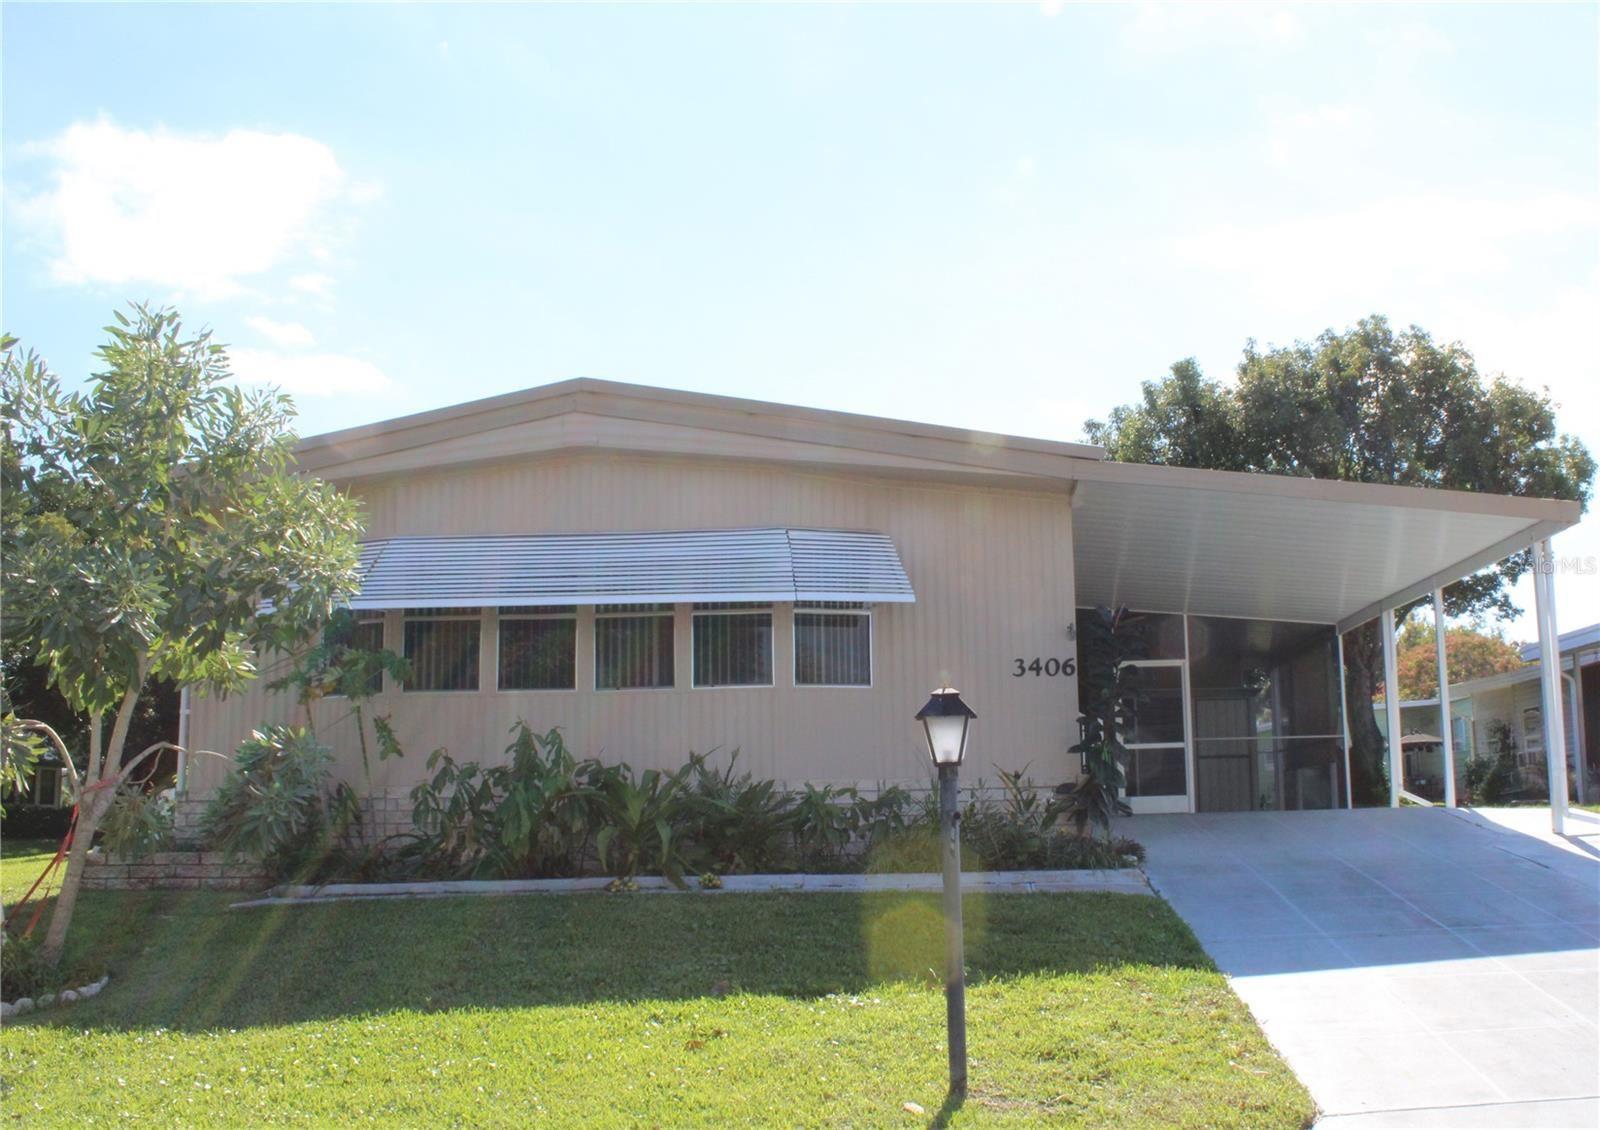 3406 OVERLOOK ROAD #1630, Zellwood, FL 32798 - #: O5963328